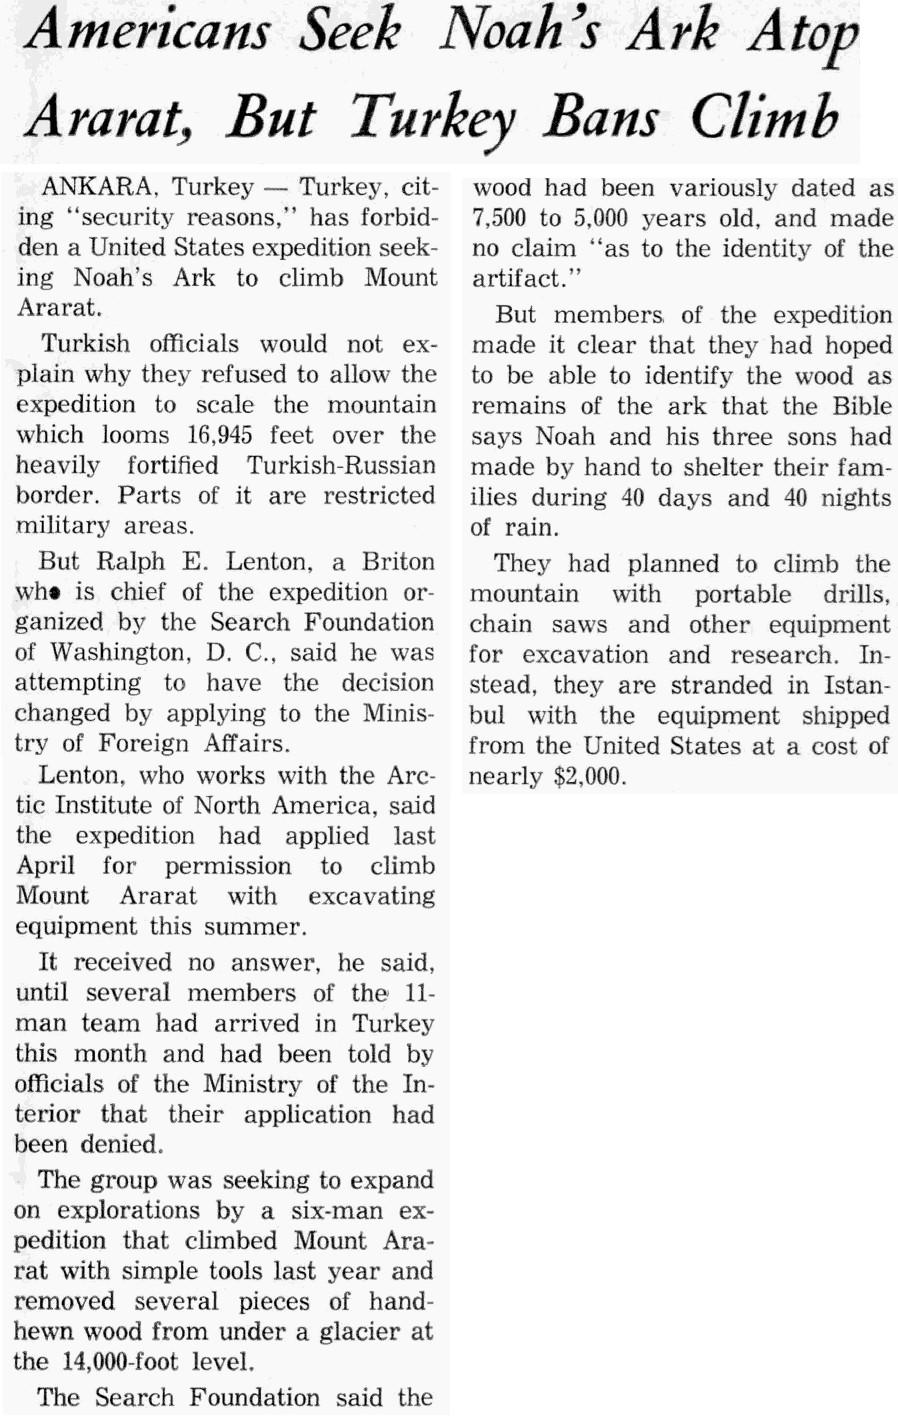 Americans Seek Noah's Ark Atop Ararat, But Turkey Bans Climb